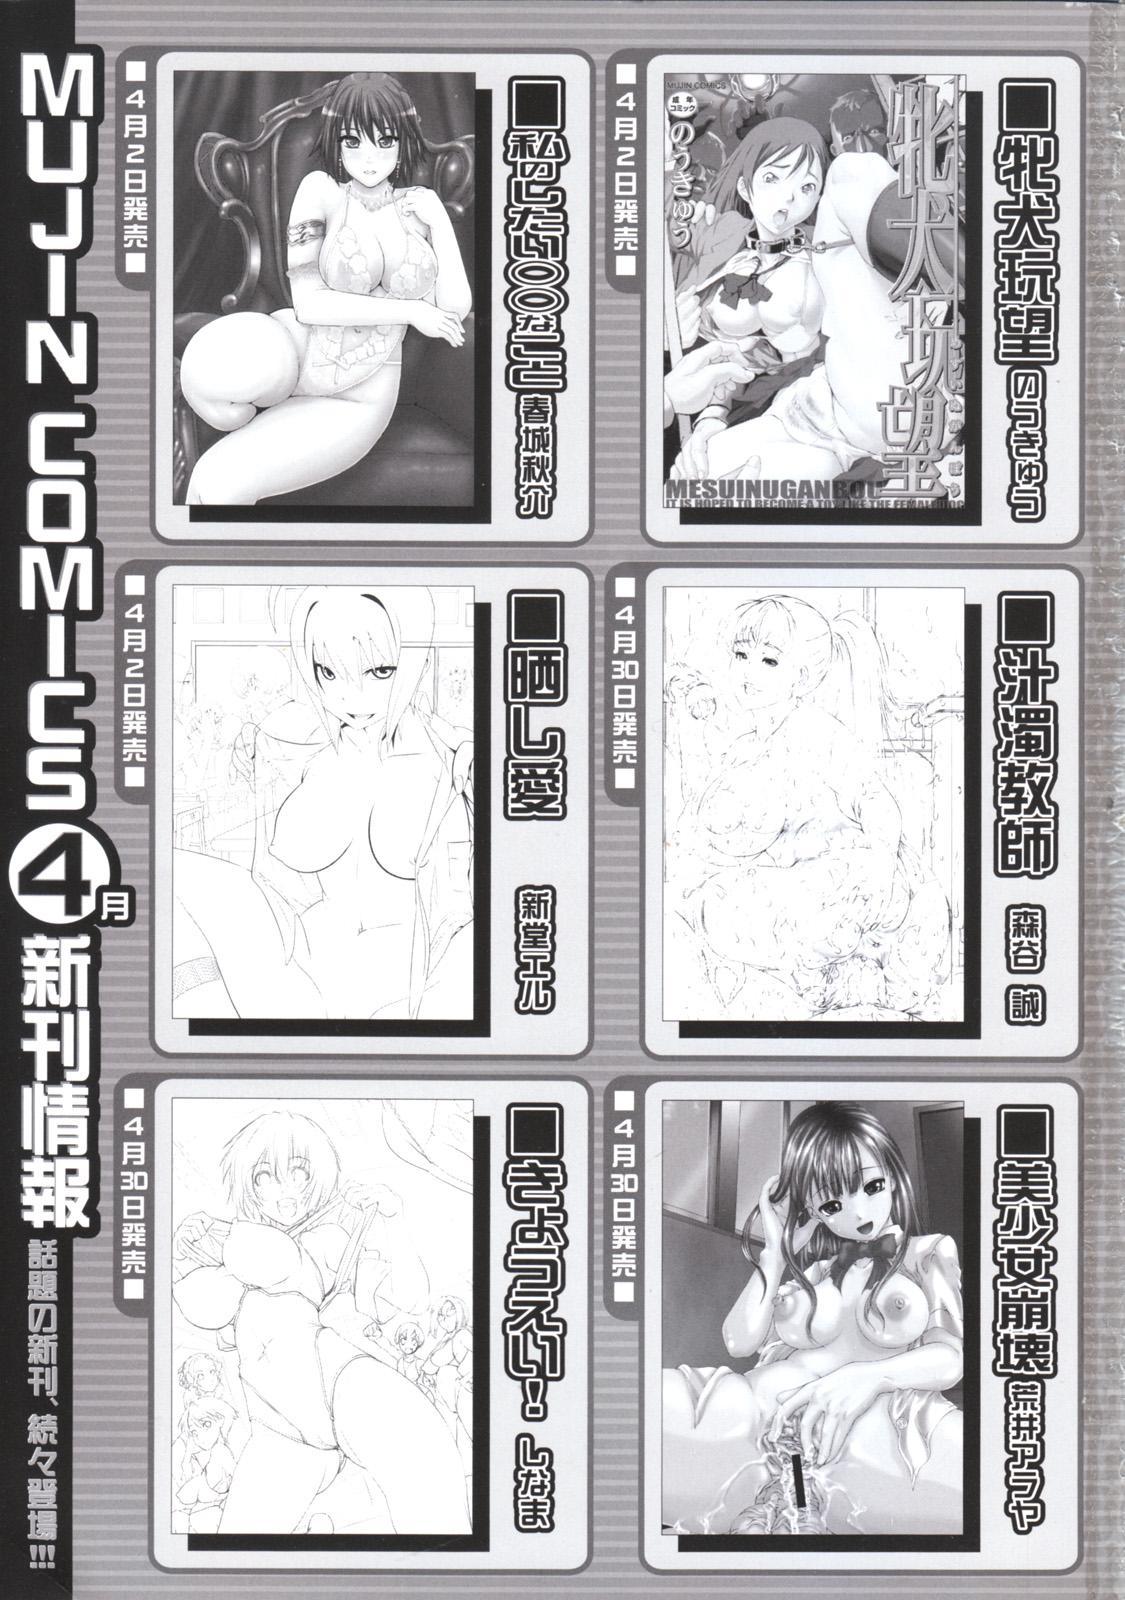 BUSTER COMIC 2010-05 Vol.07 489